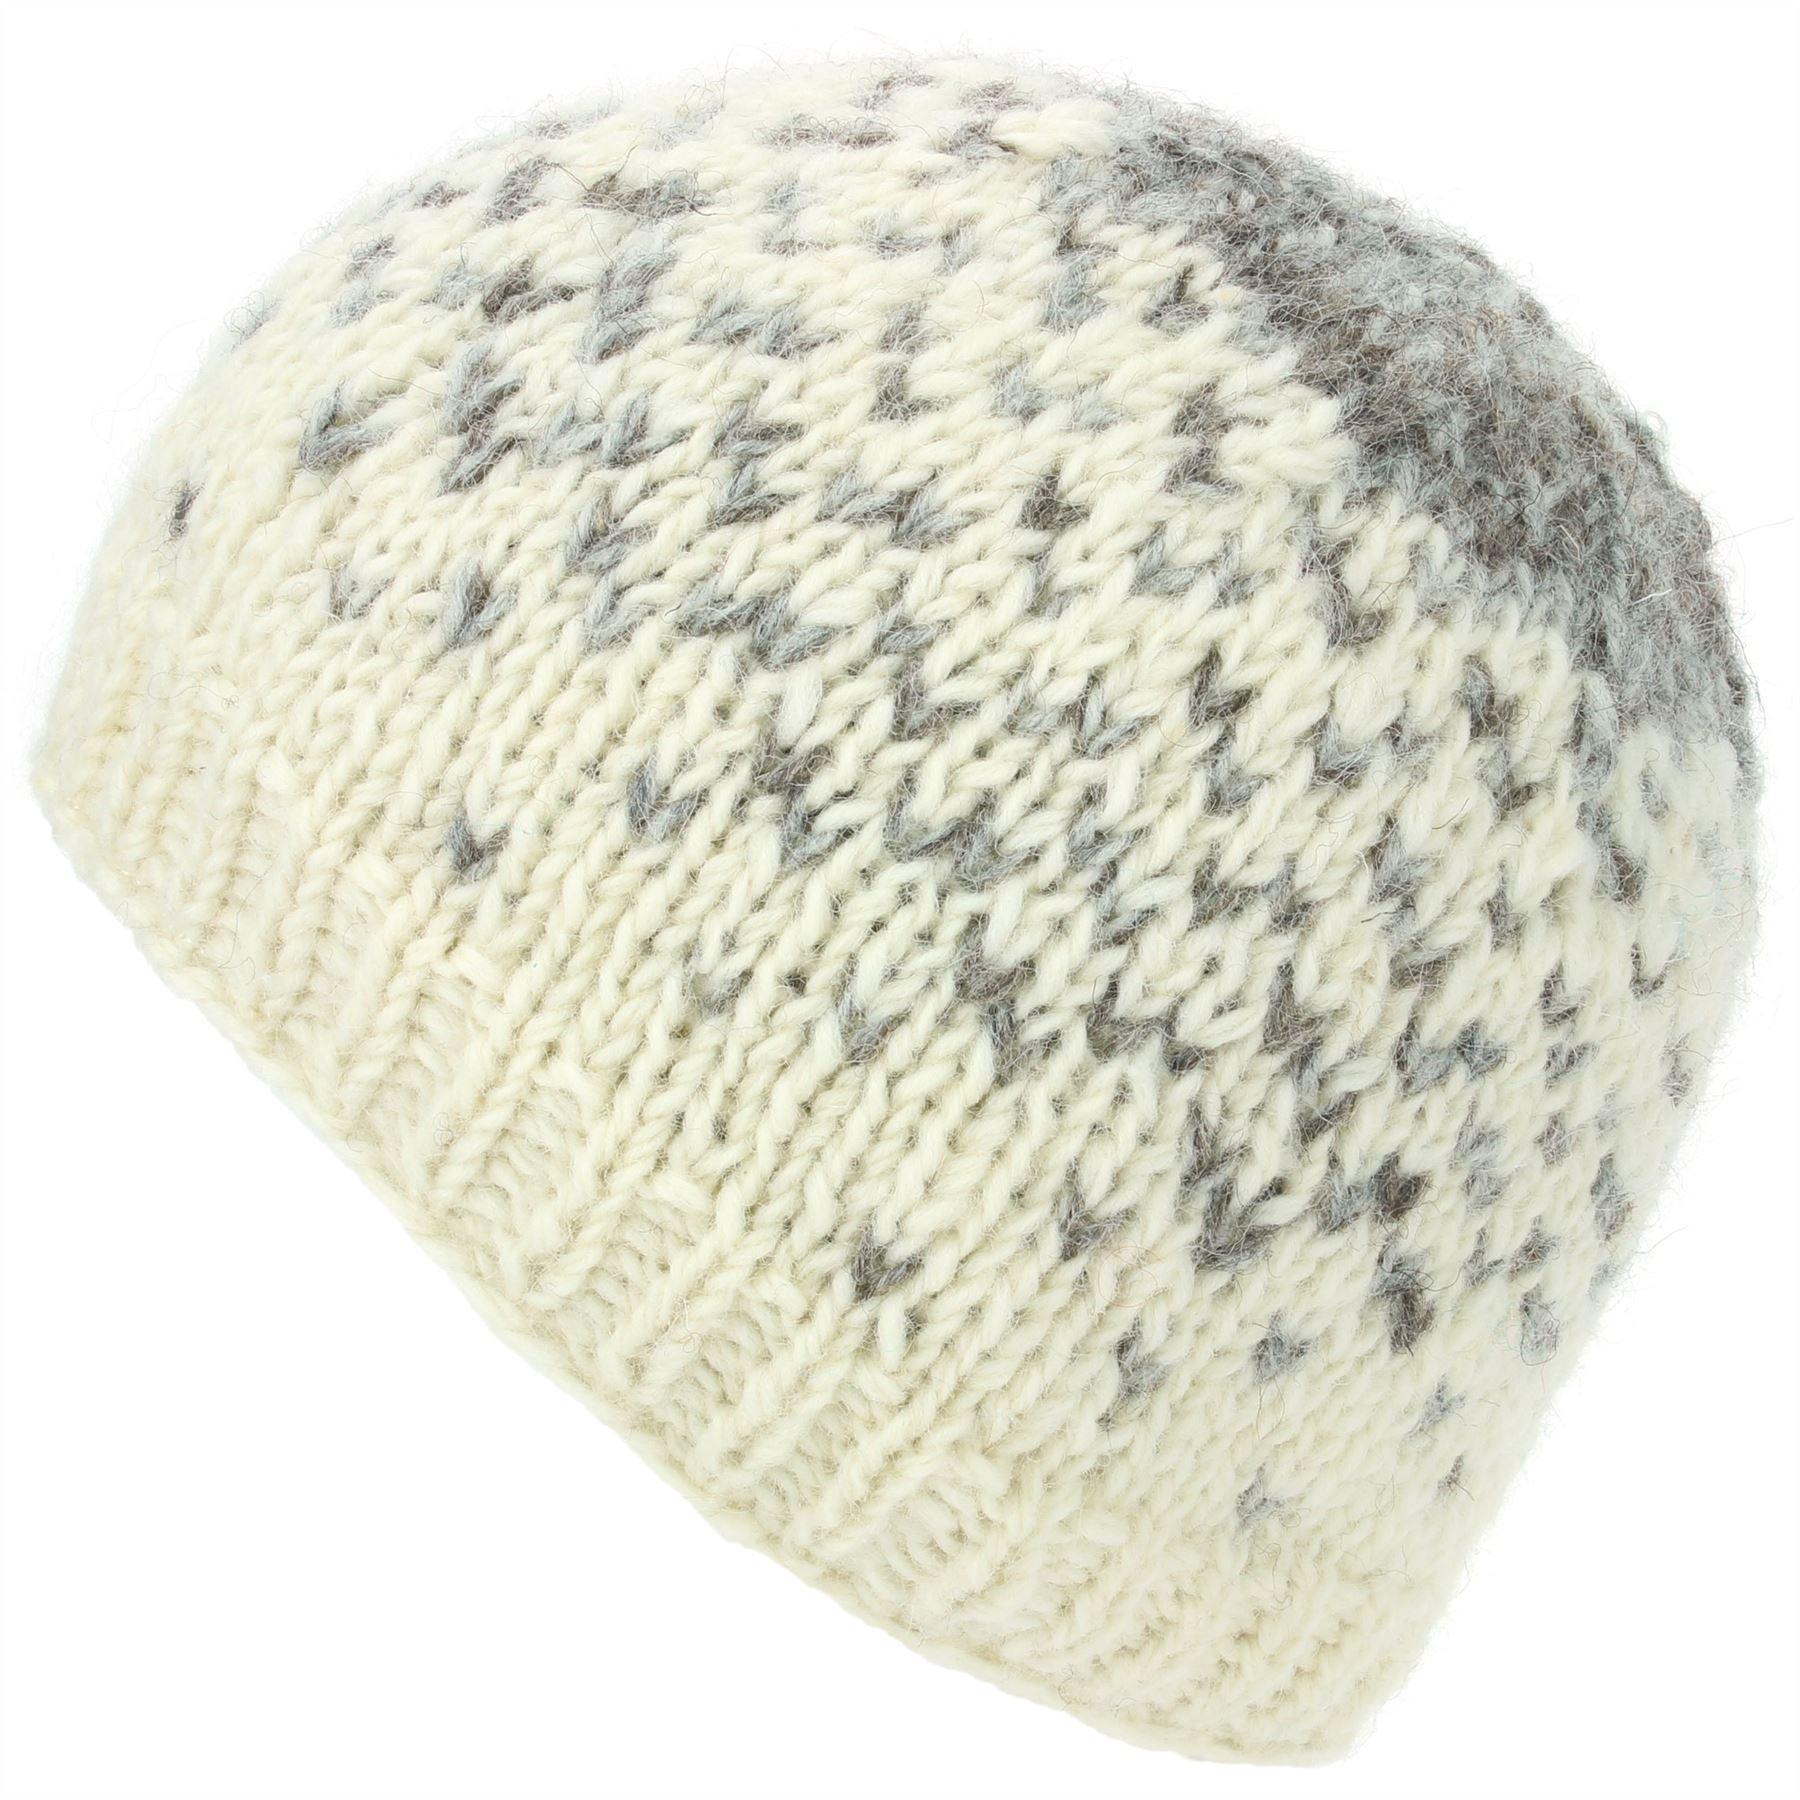 2b35507cdbf Warm Cap Soft cyan Loudelephant Hat magenta cream Ski Knit Black Colourful  Winter Wool Lined Beanie wxCtBqpC